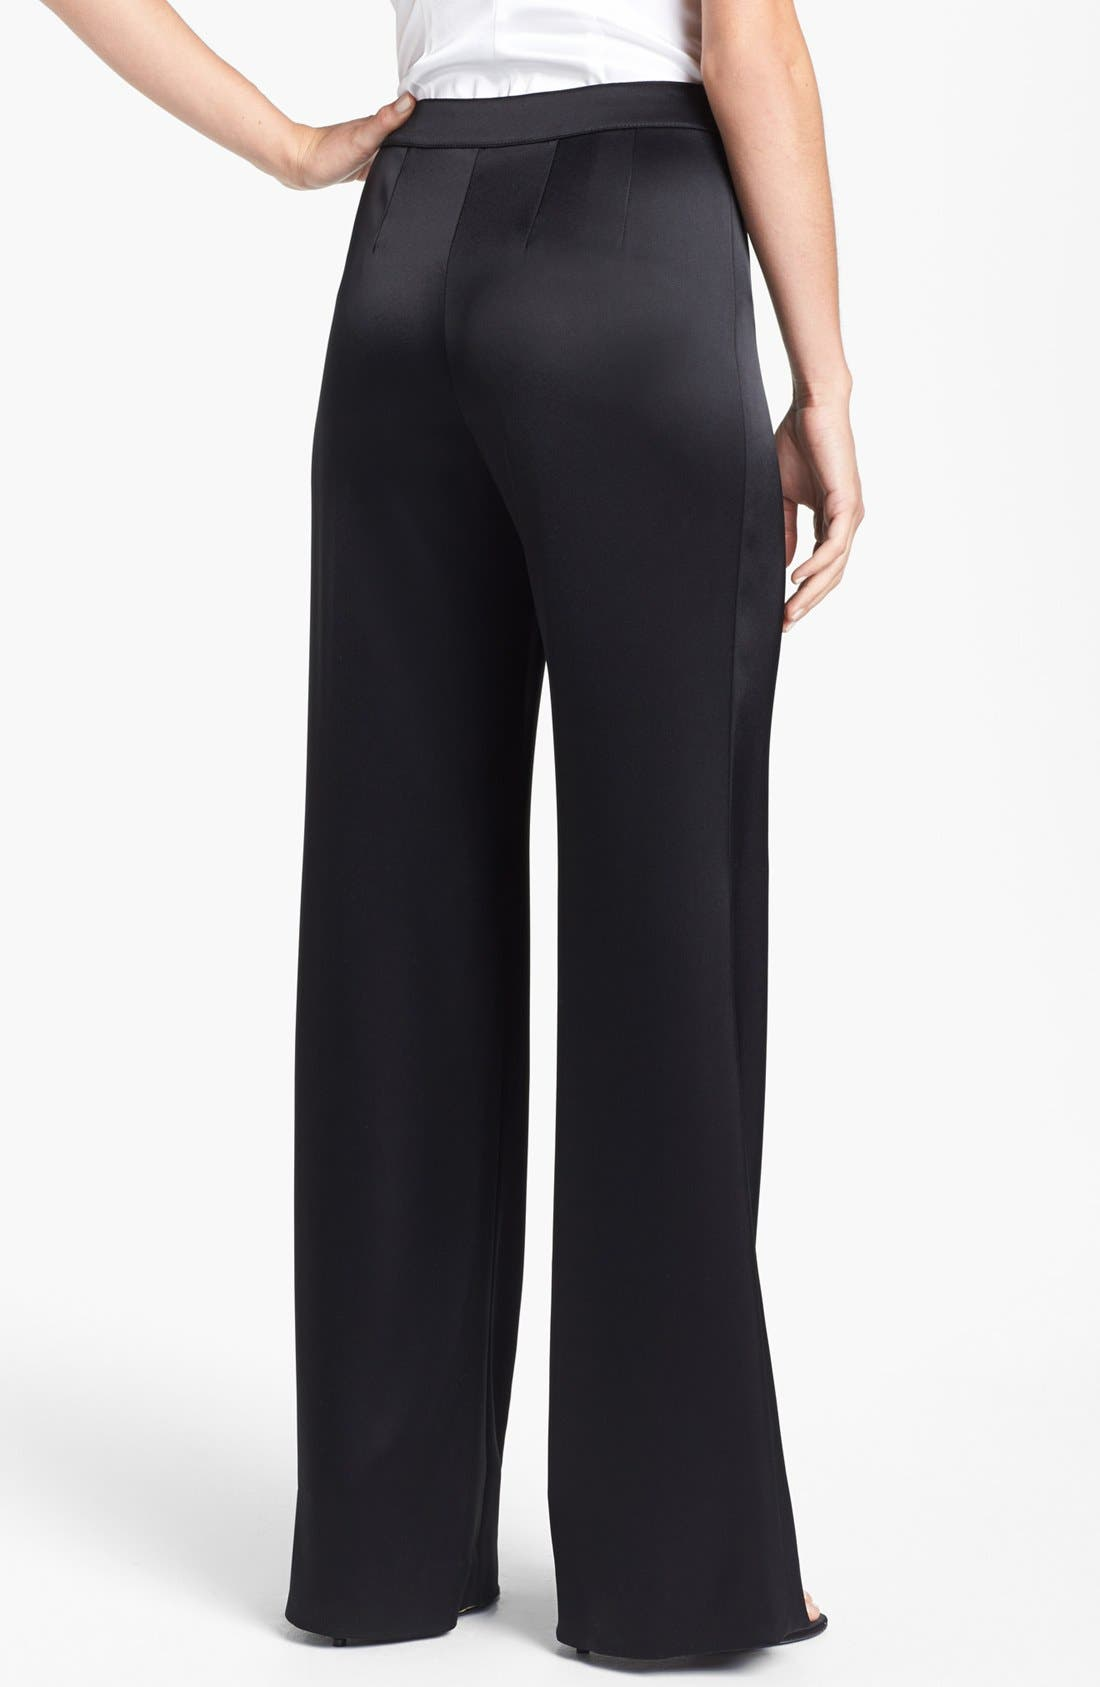 Alternate Image 3  - St. John Collection 'Diana' Wide Leg Liquid Satin Pants